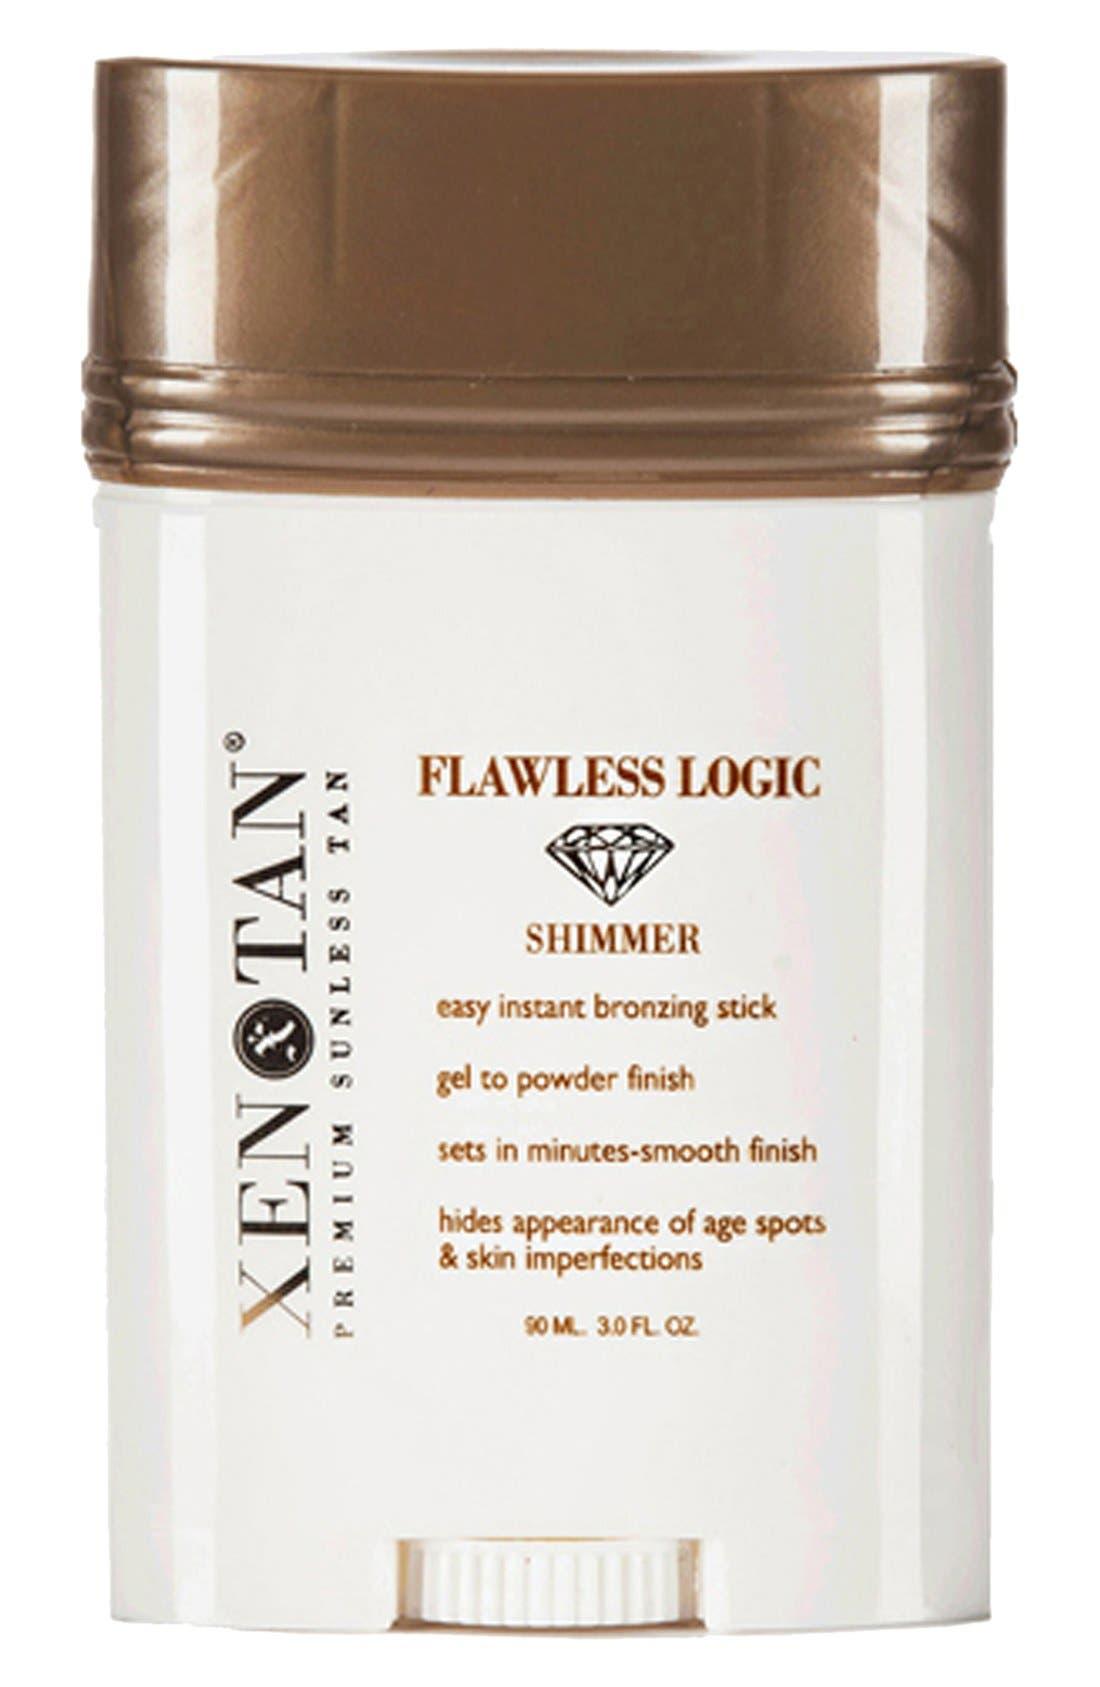 'Flawless Logic' Bronzing Stick,                         Main,                         color, 000